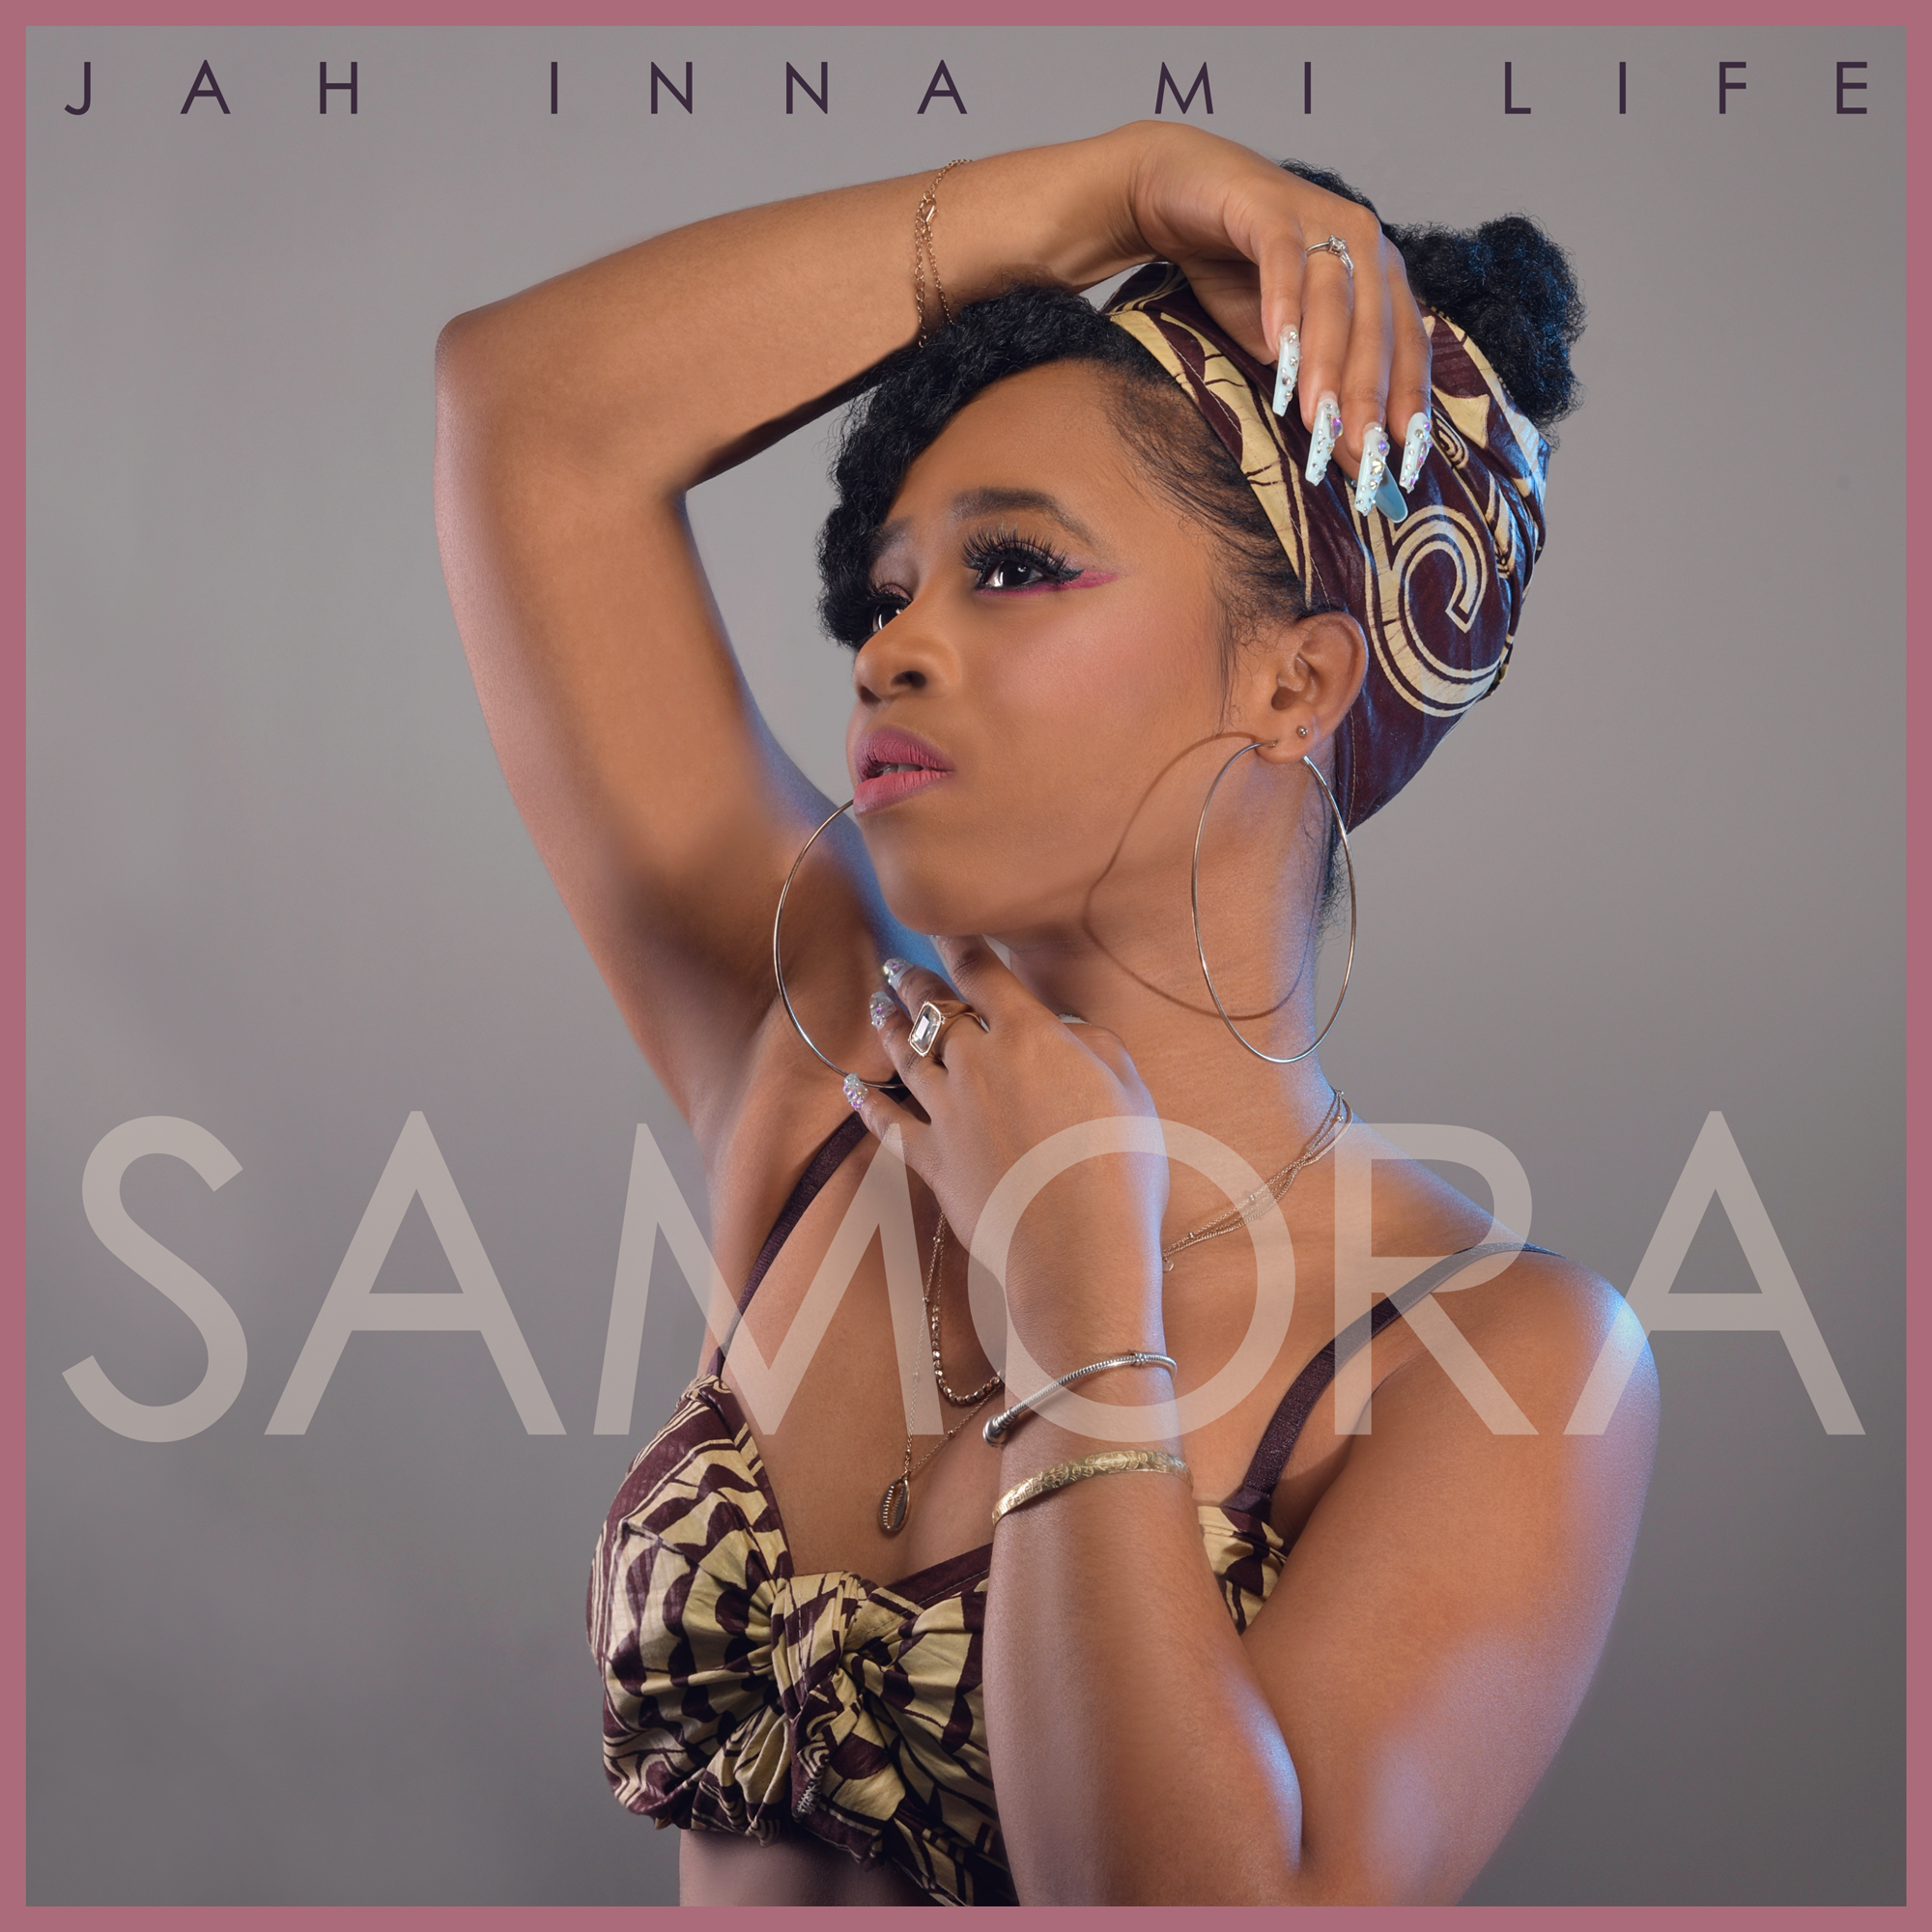 Samora - Jah Inna Me Life